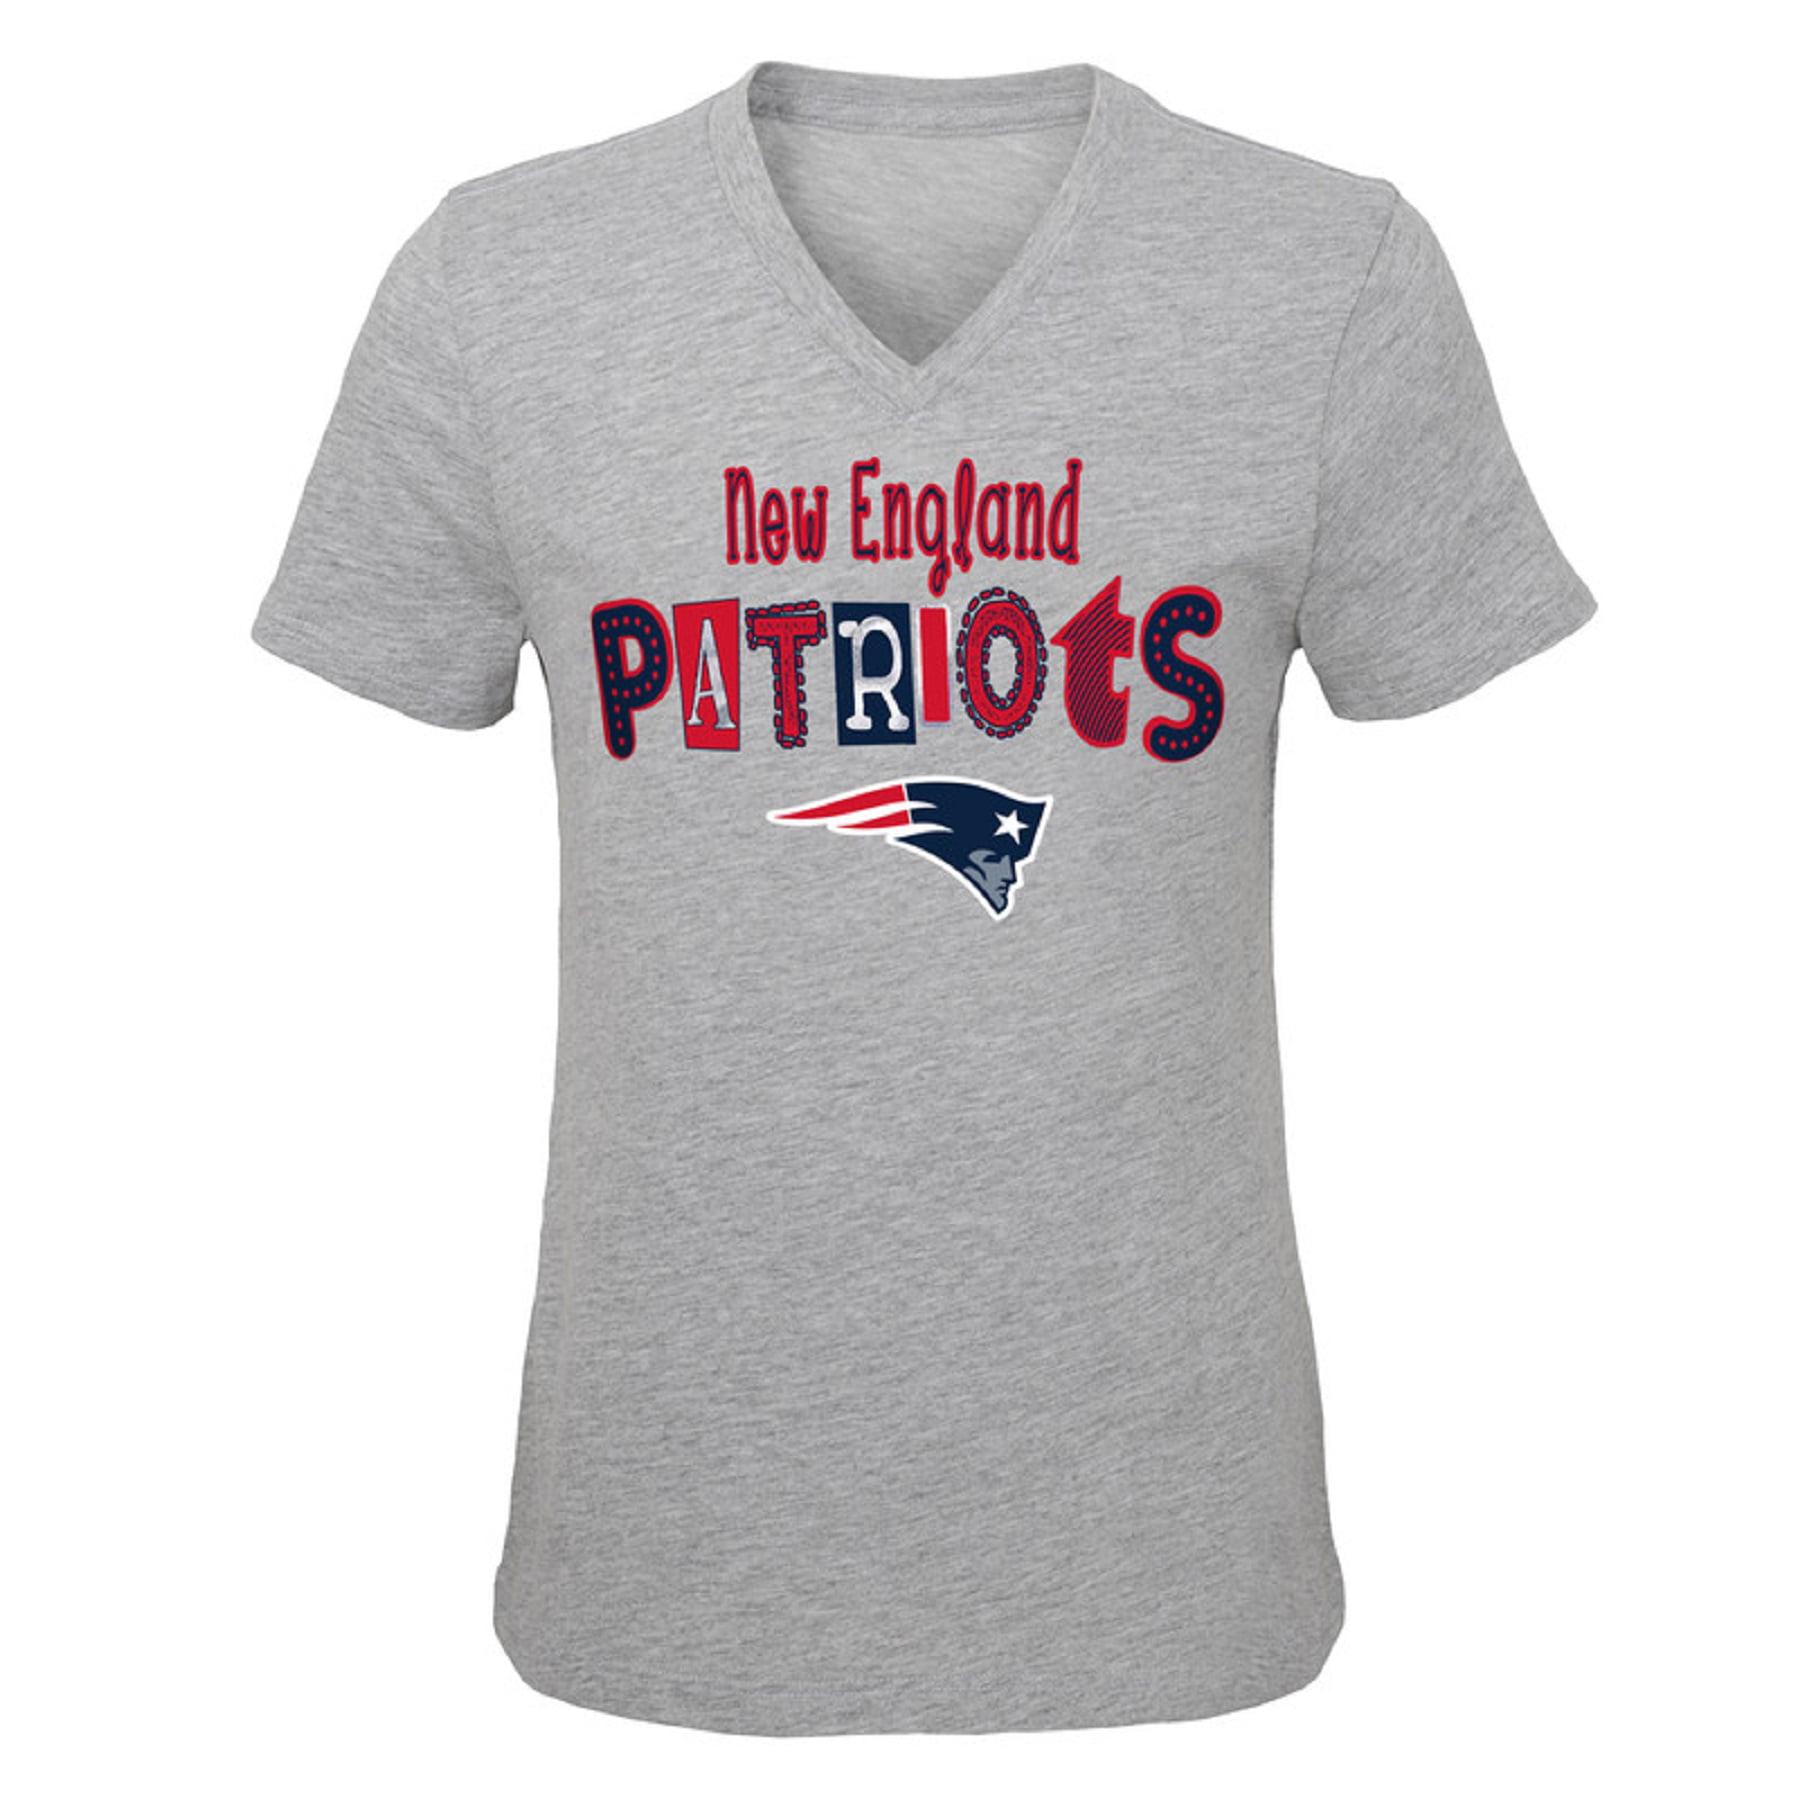 Girls Youth Heathered Gray New England Patriots Metallic V-Neck T-Shirt